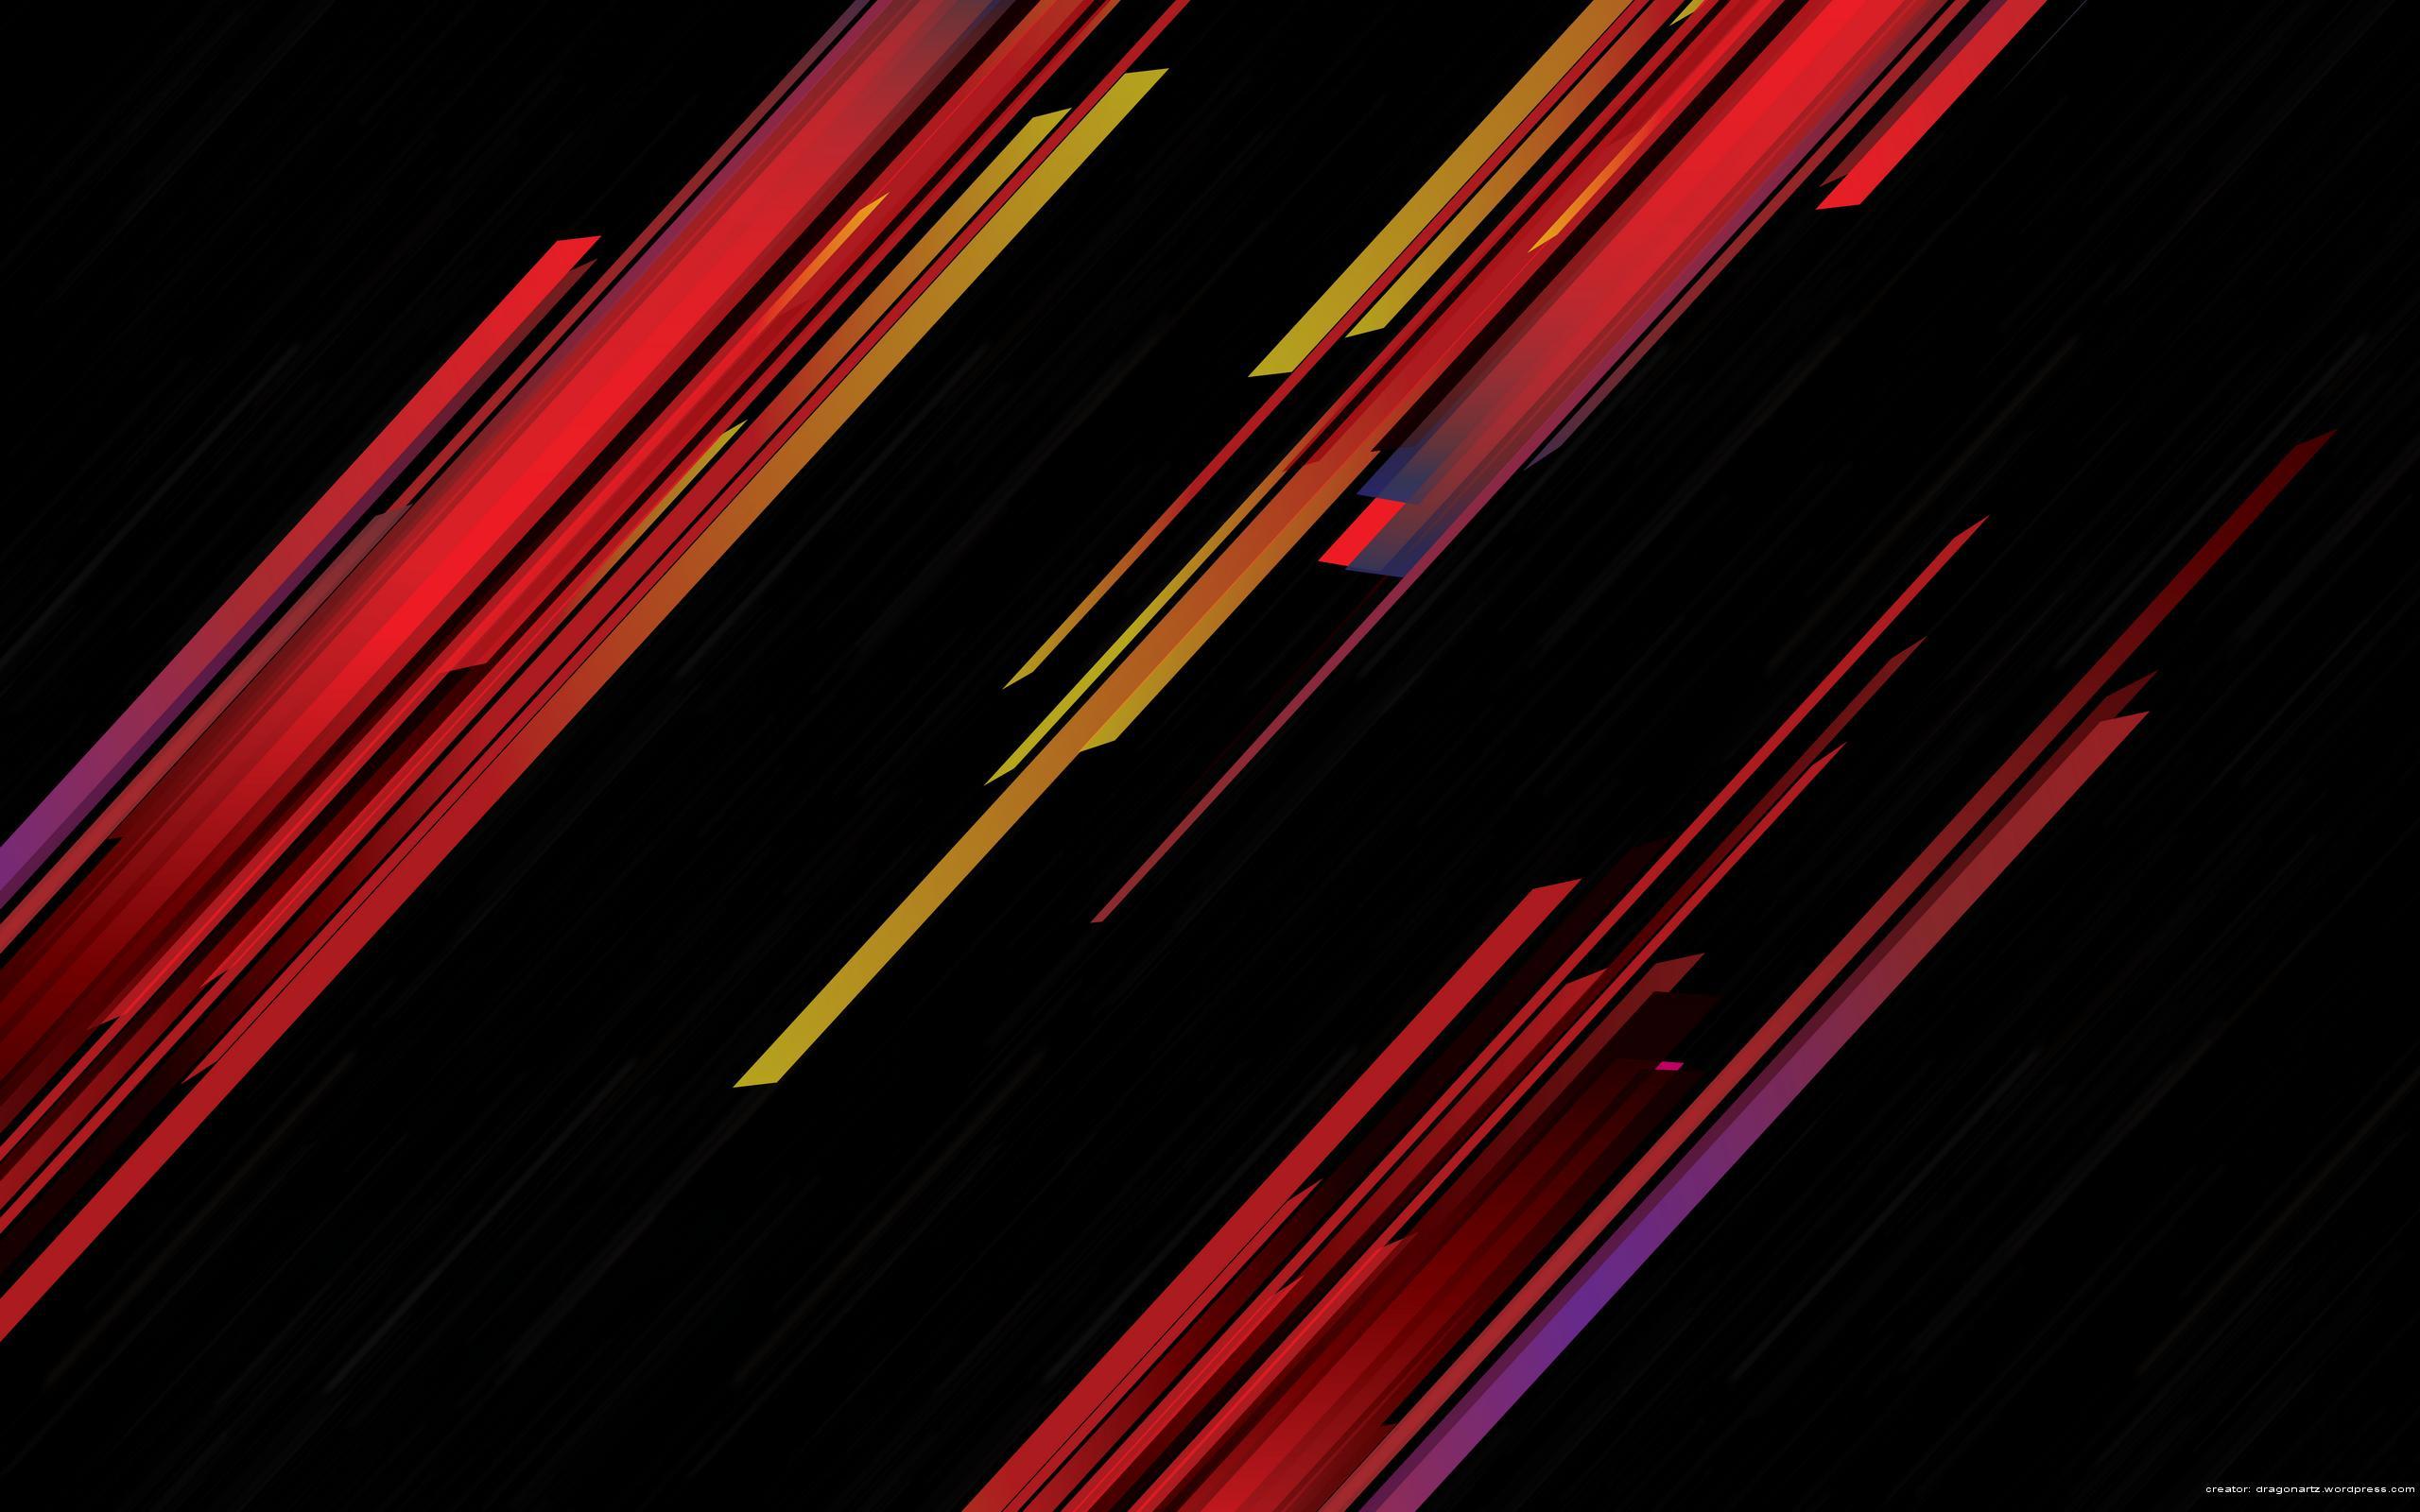 Super Amoled Amoled Wallpaper 1440p 2560x1600 Wallpaper Teahub Io